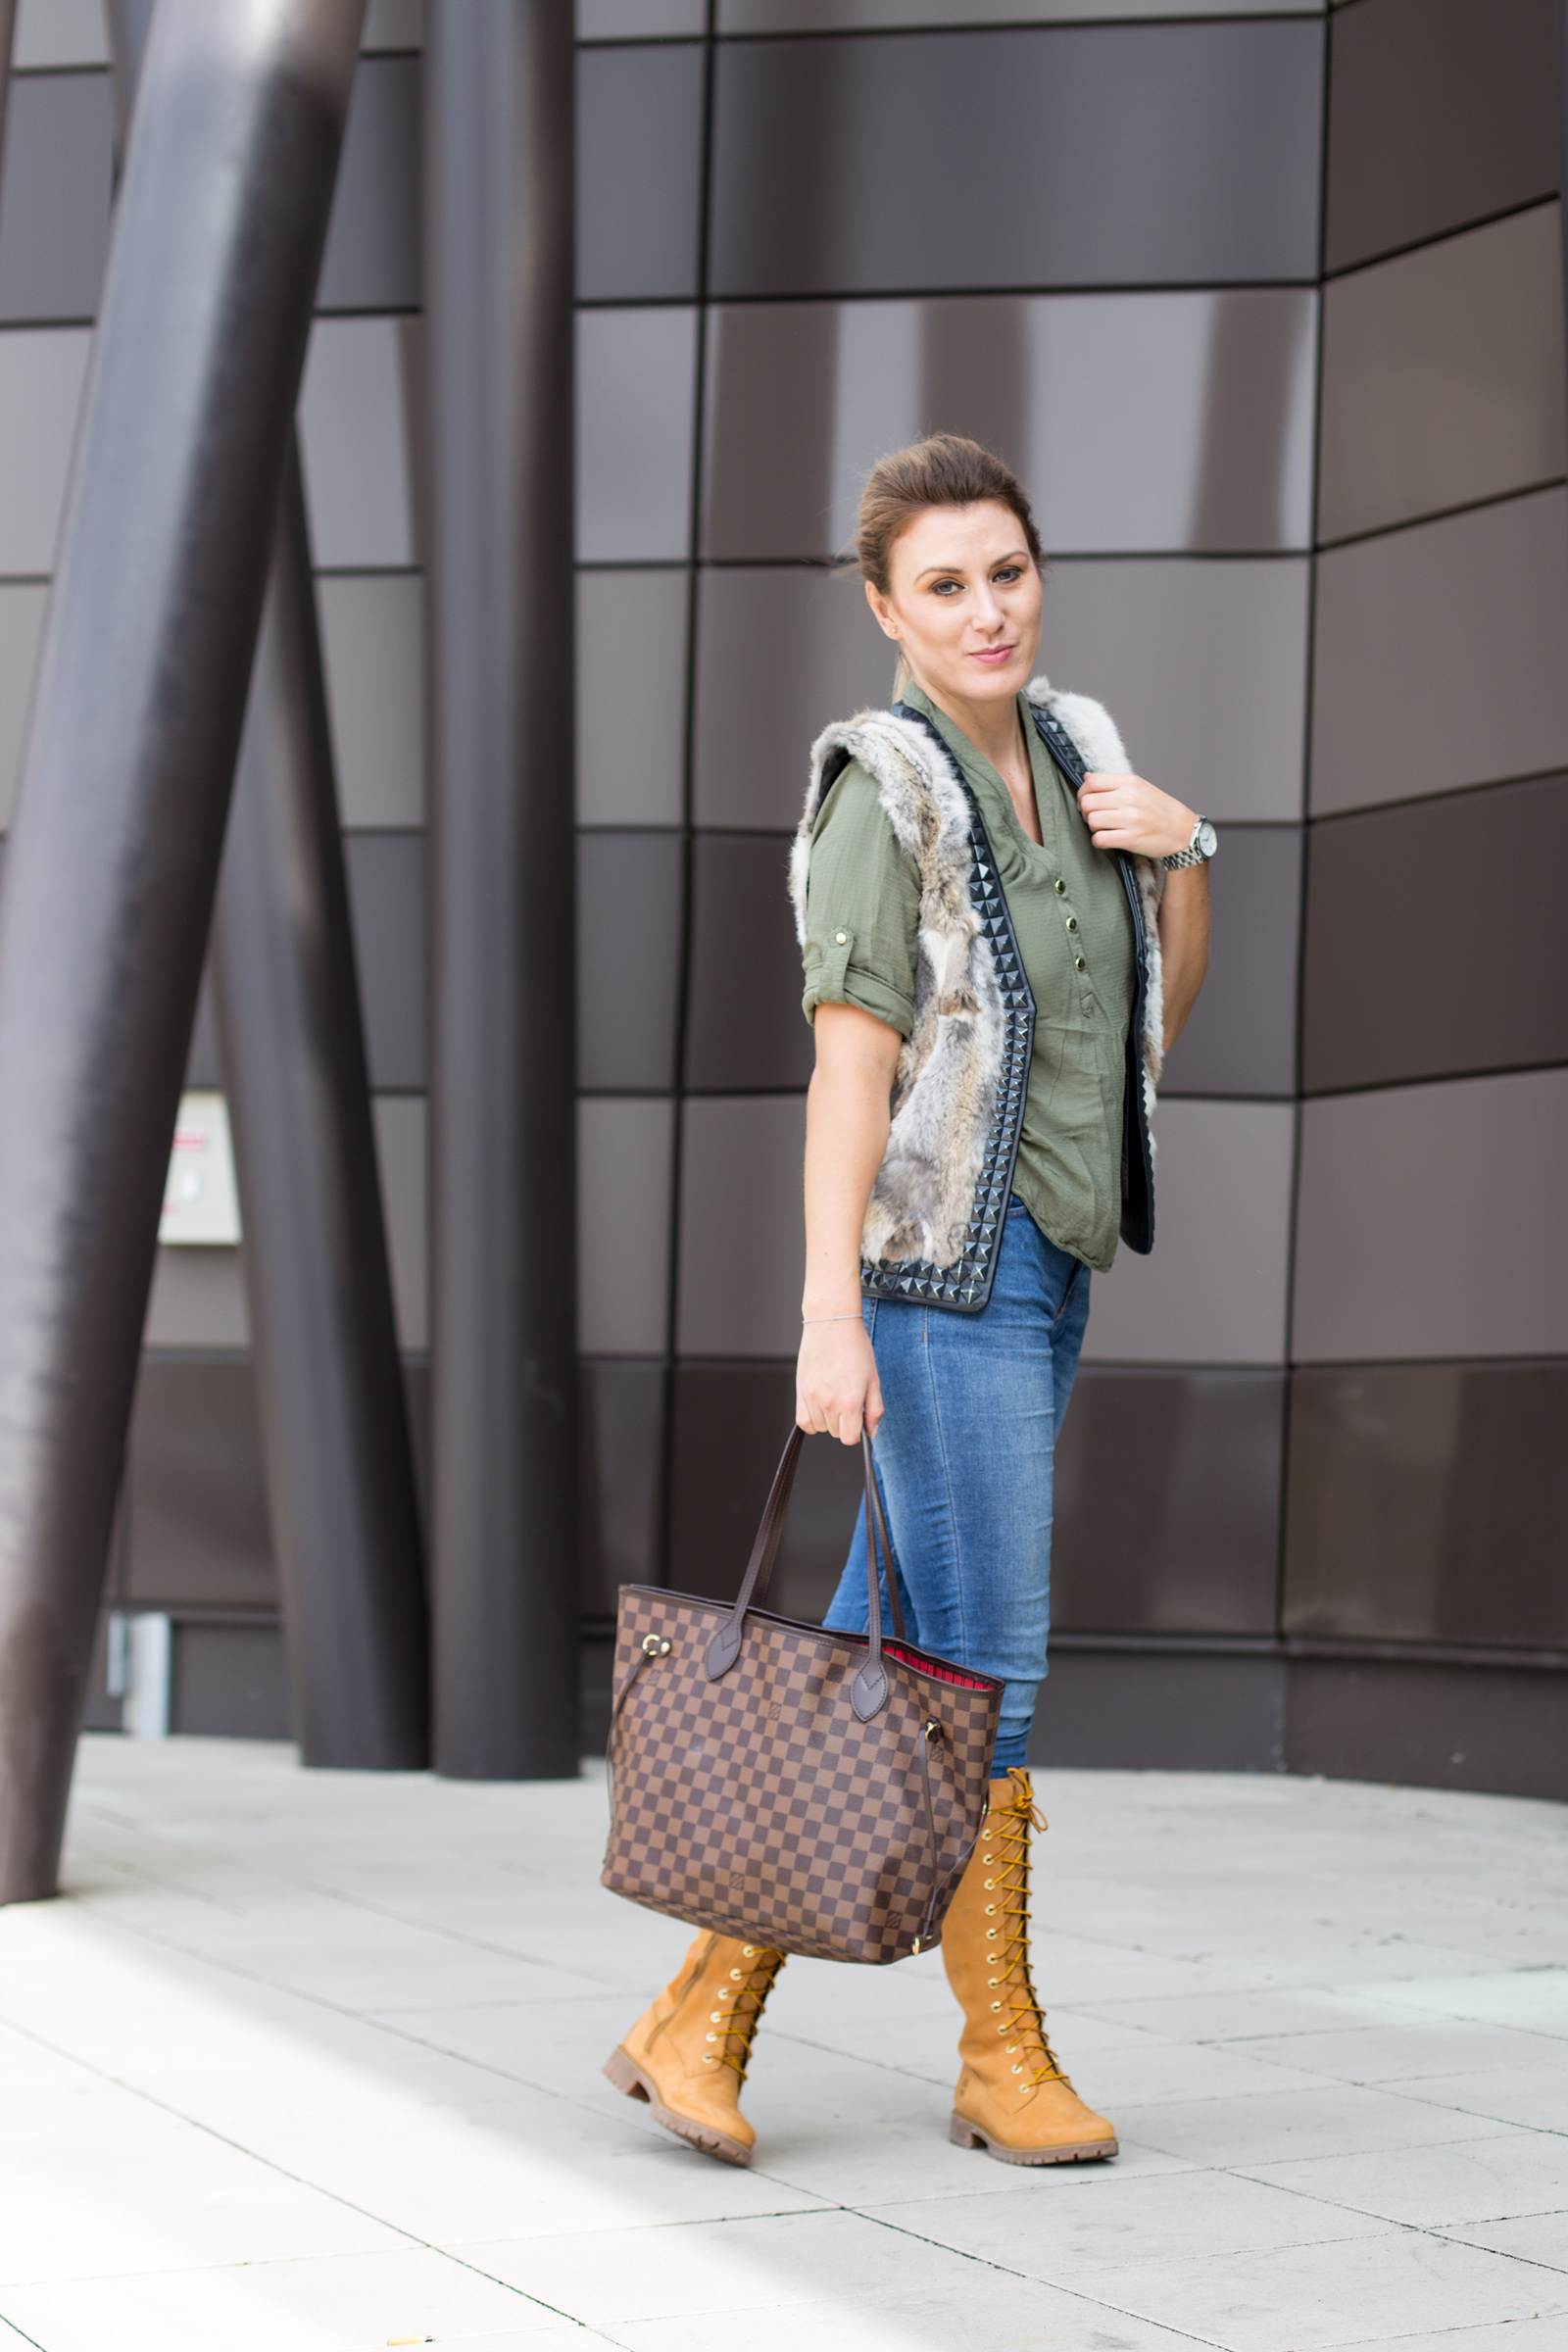 michael-kors-watch-newone-Foto-by-Nadja-Nemetz-Wien-wienerblogger-blogger-fashionblogger-modeblogger-fashion-mode-outfit-louis-vuitton-neverfull-handbag-handtasche-timberland-stiefel-olive-shirt-primark-fellgilet-fell-pelz-pelzgilet-6